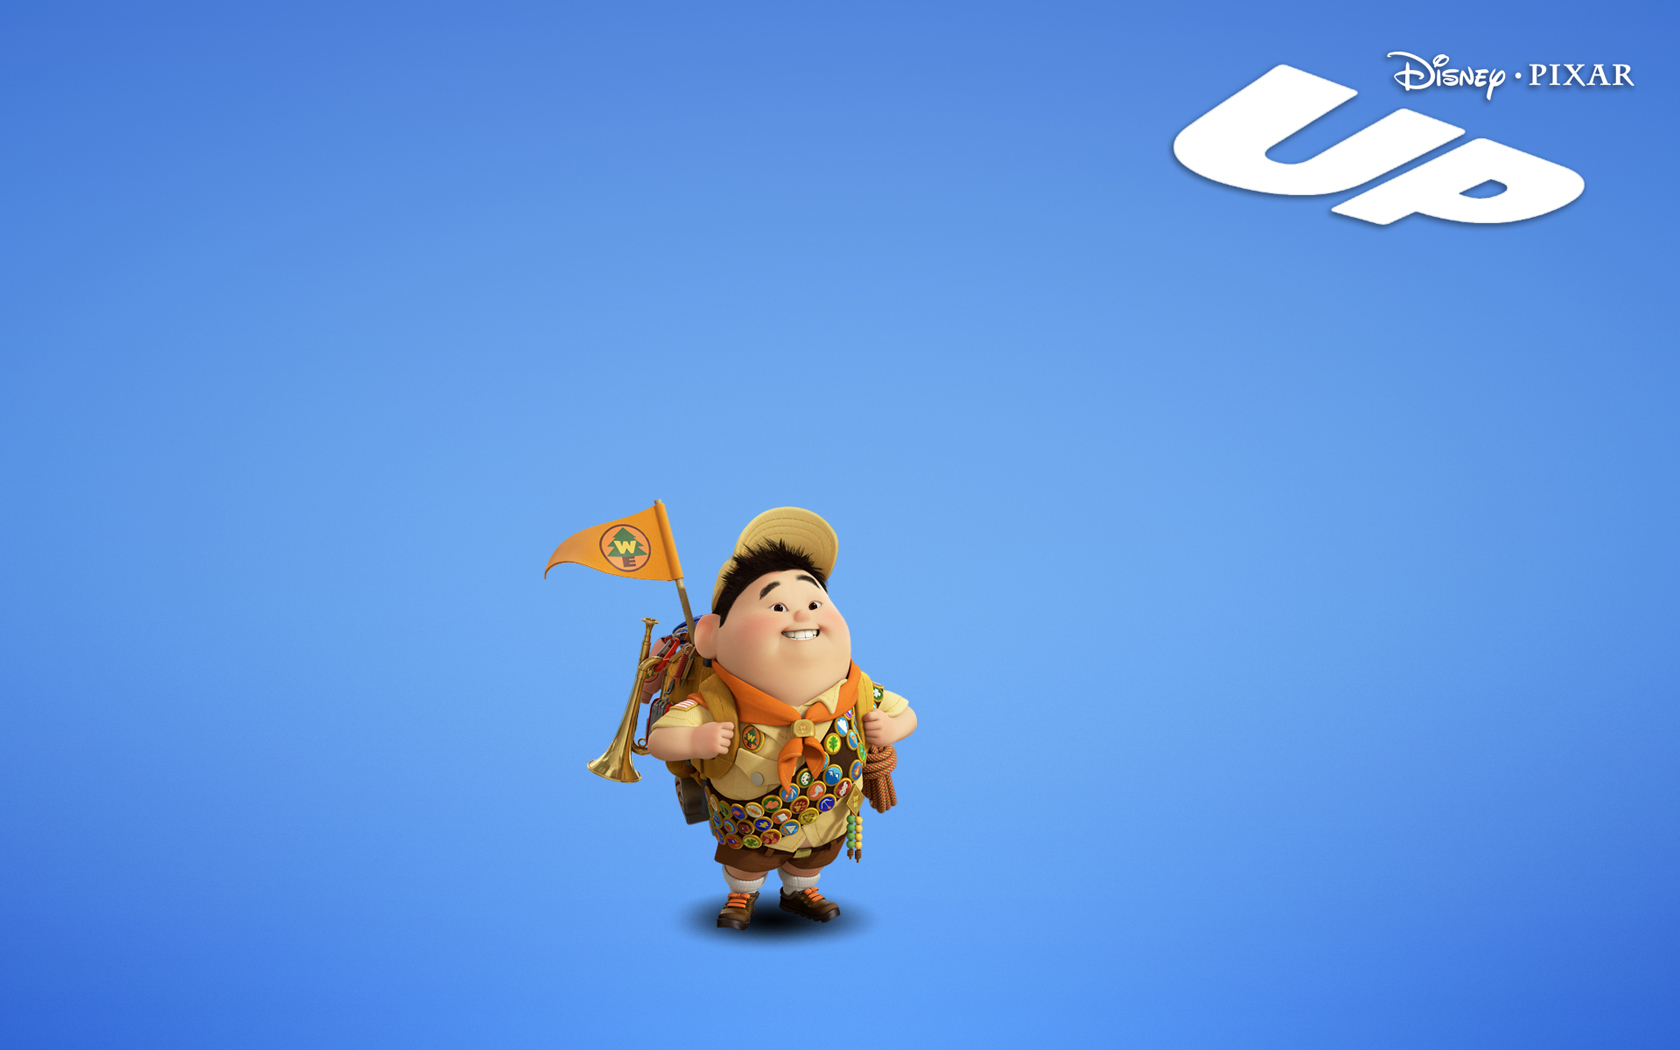 Disney Wallpaper 1680x1050 Pixar Disney Company Movies 1680x1050